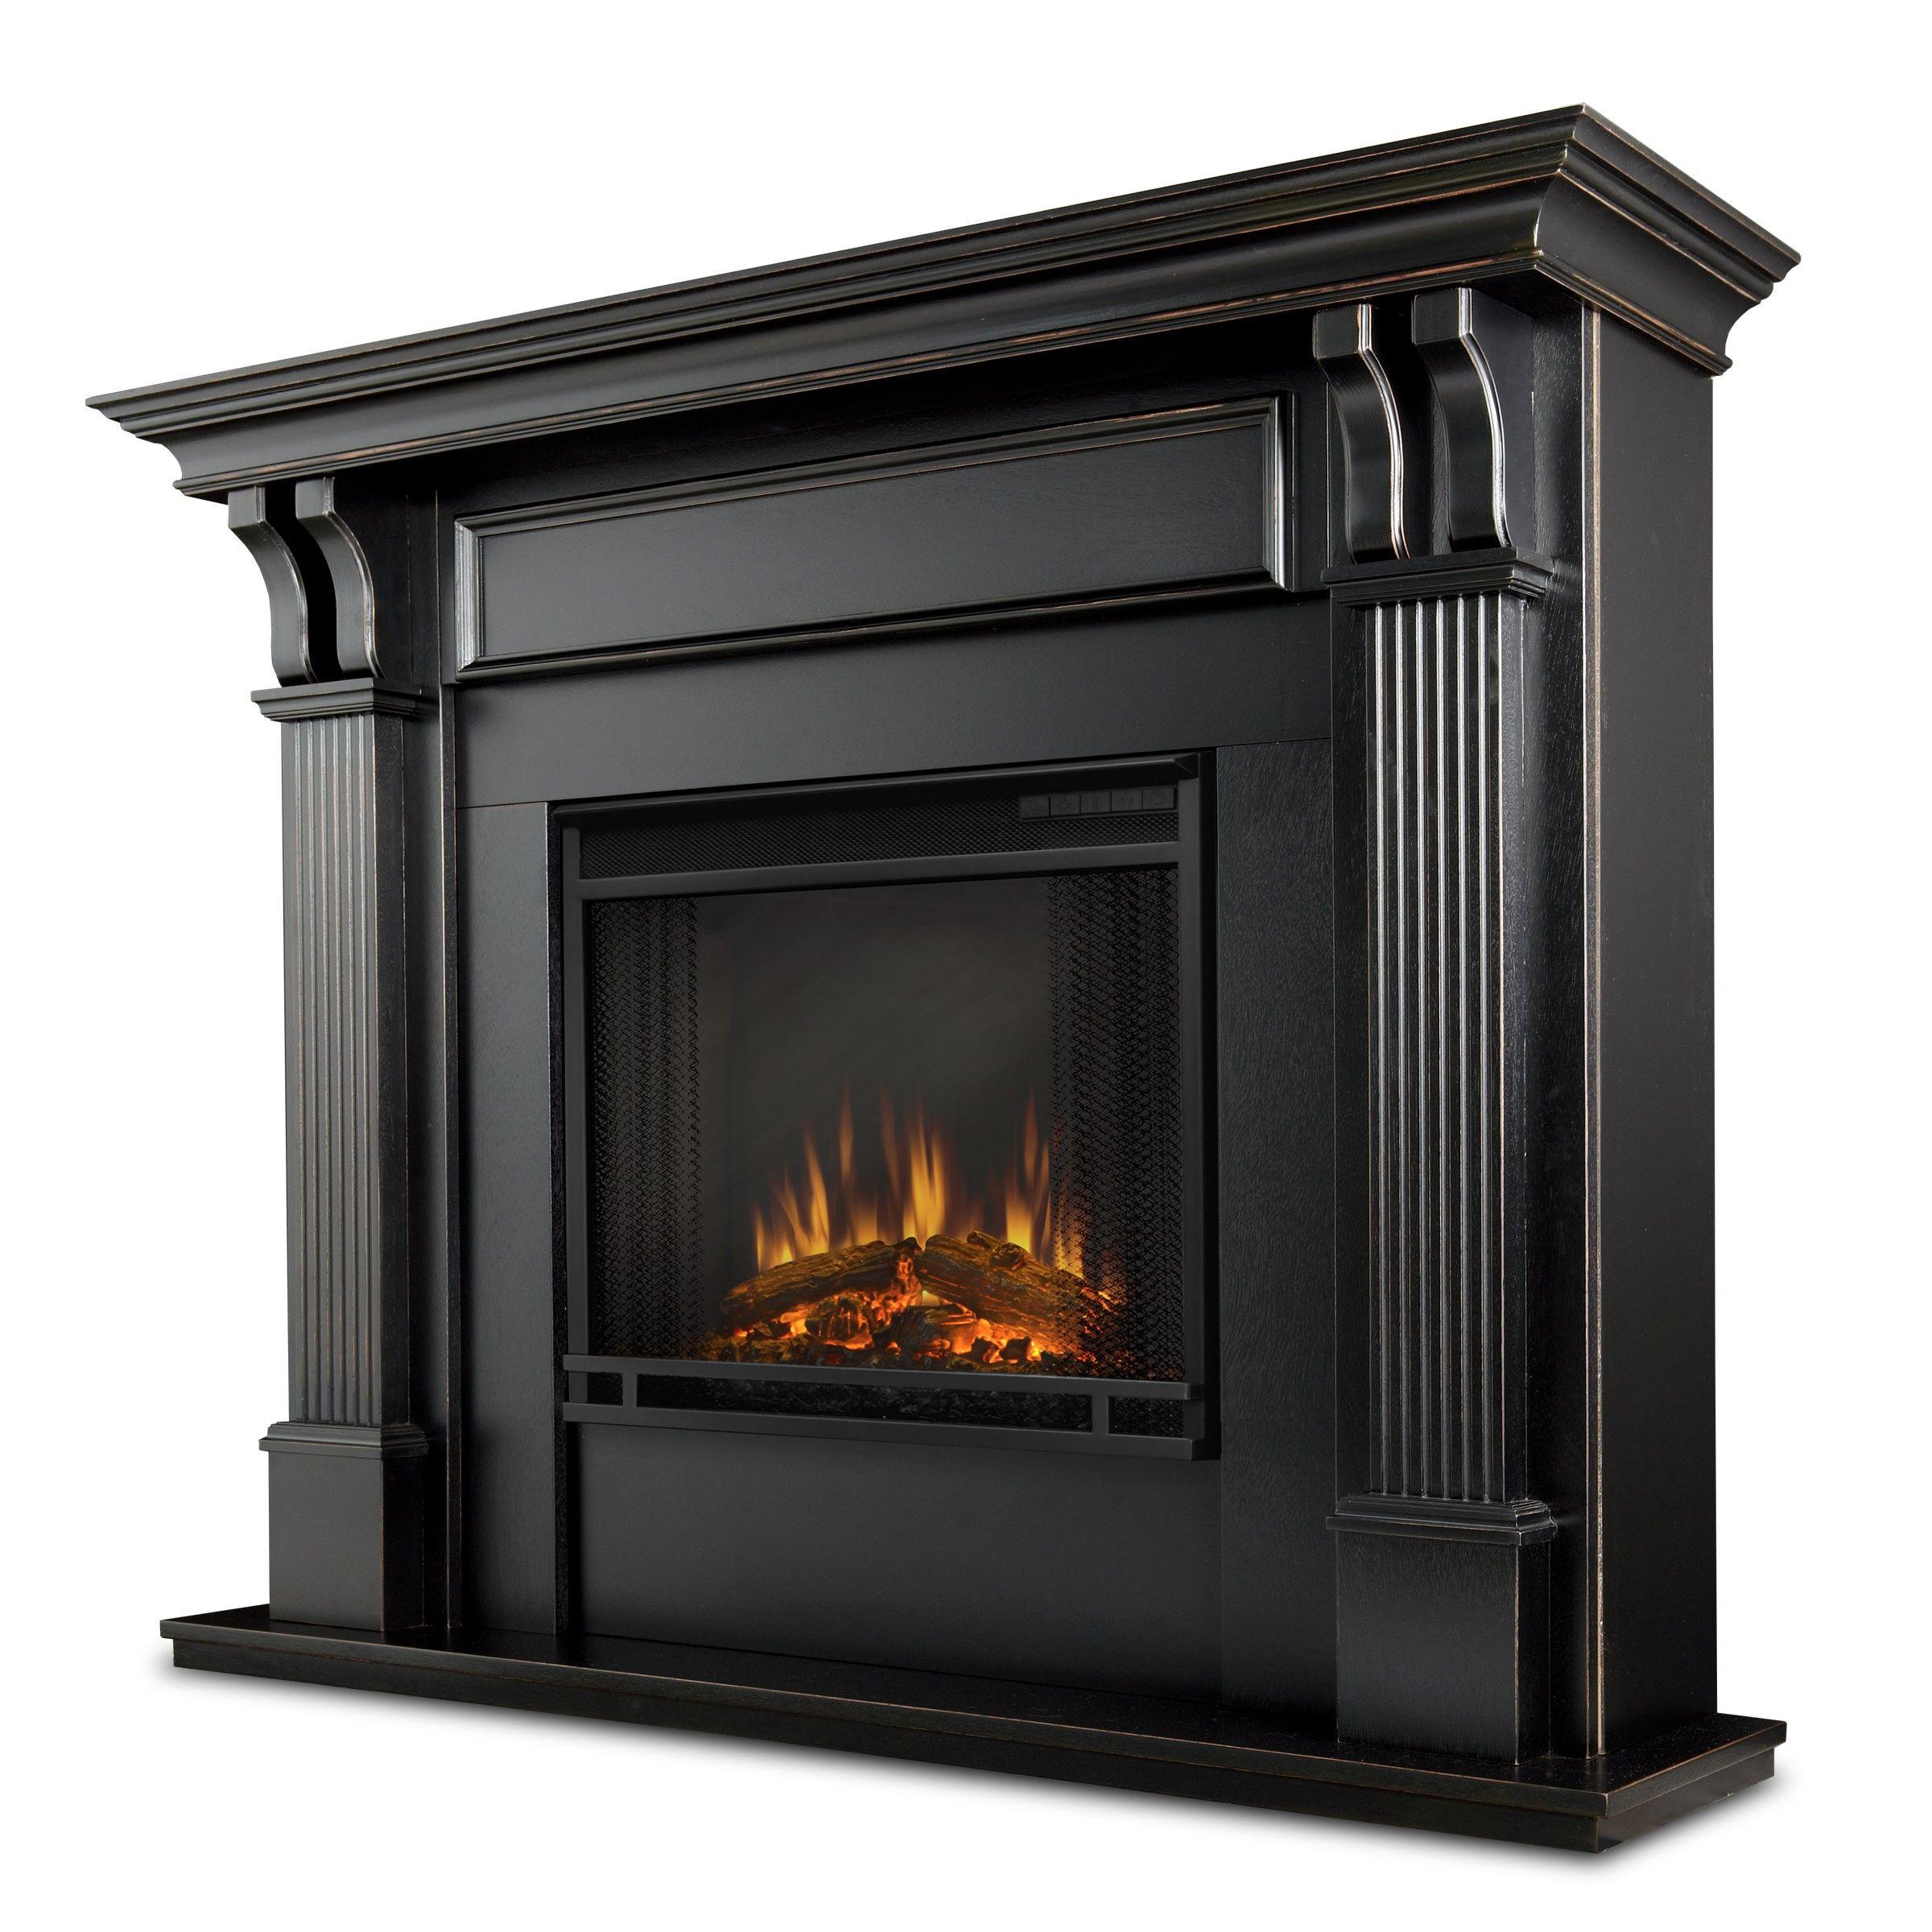 Indoor Fireplaces Electric Fireplace Black Gel